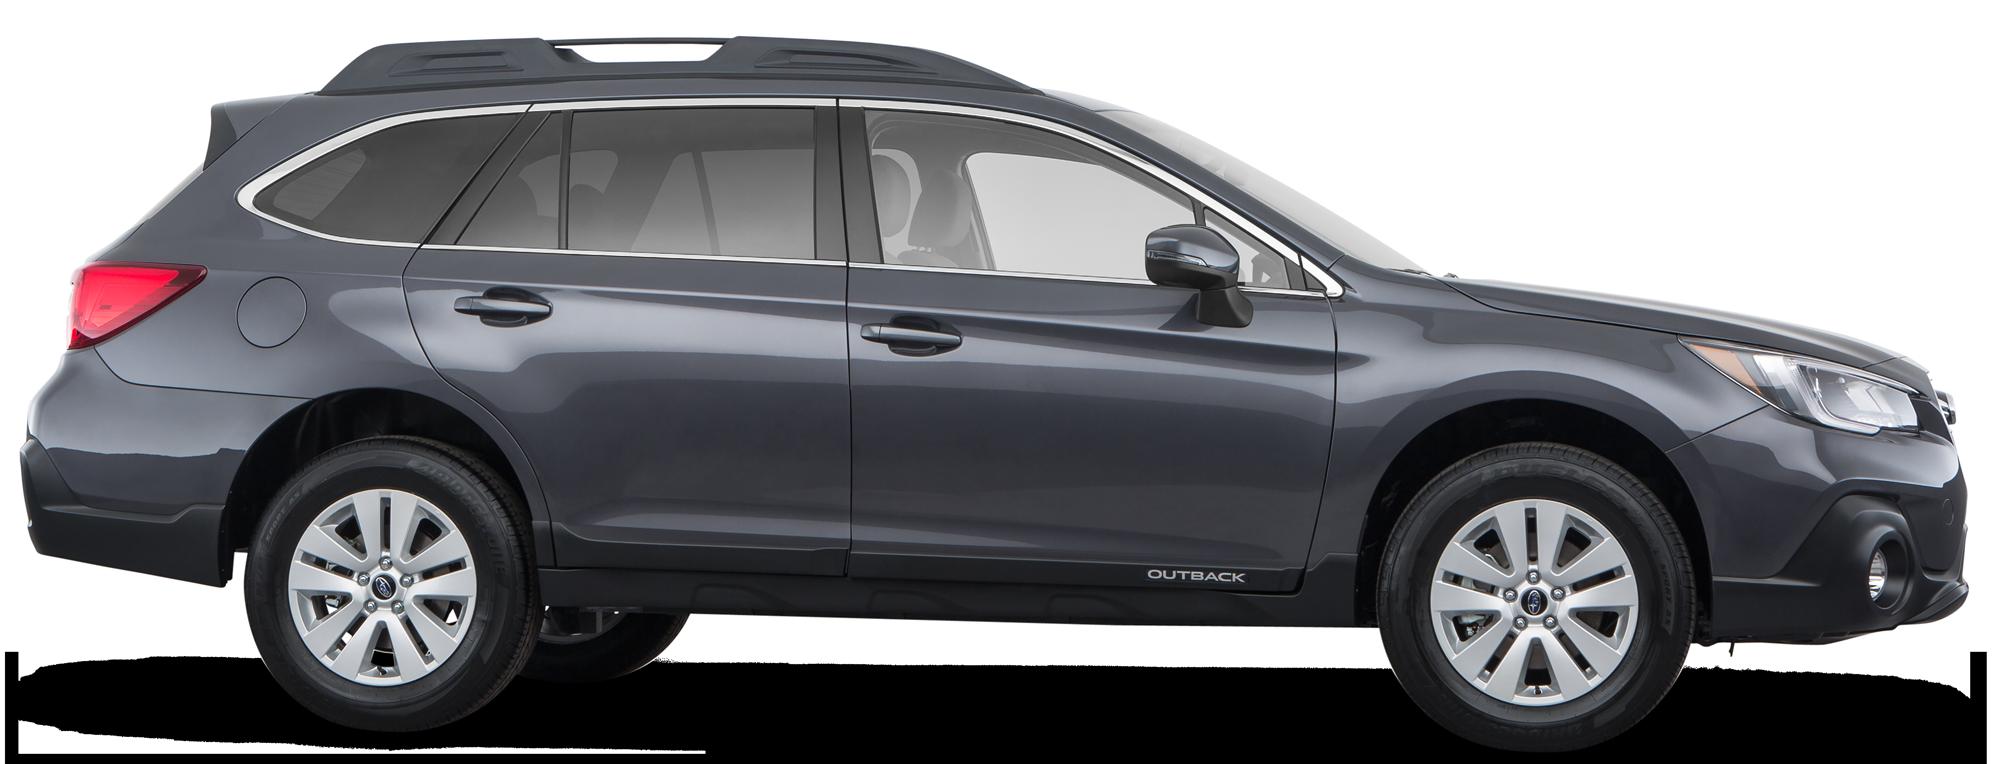 New Subaru Outback For Sale Columbus, OH: Byers Subaru Dublin